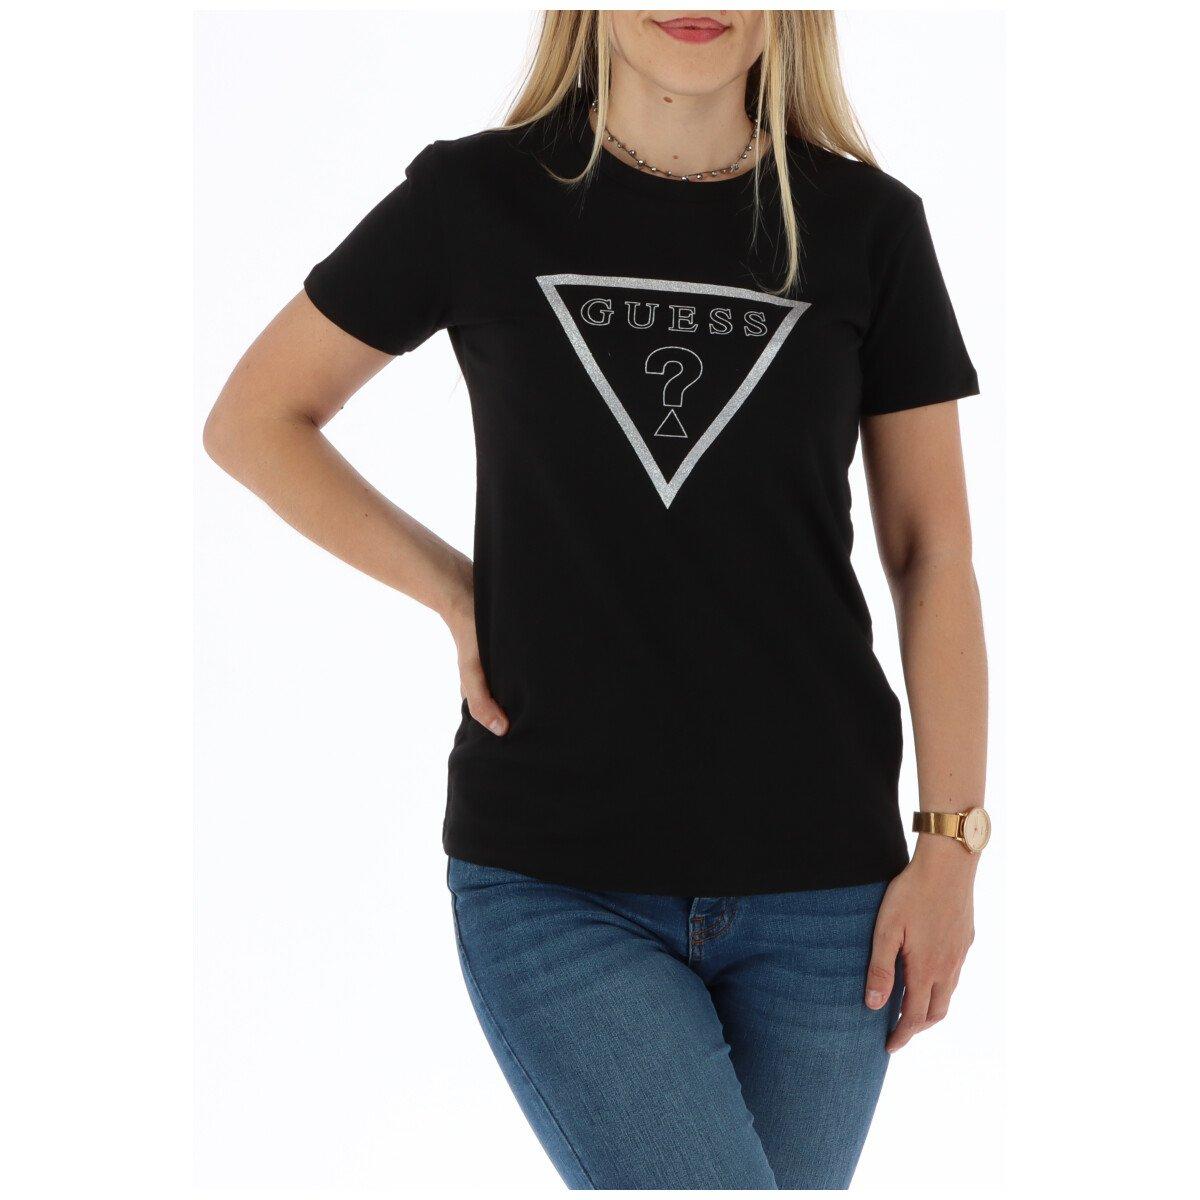 Guess Women's T-Shirt Various Colours 301064 - black XS